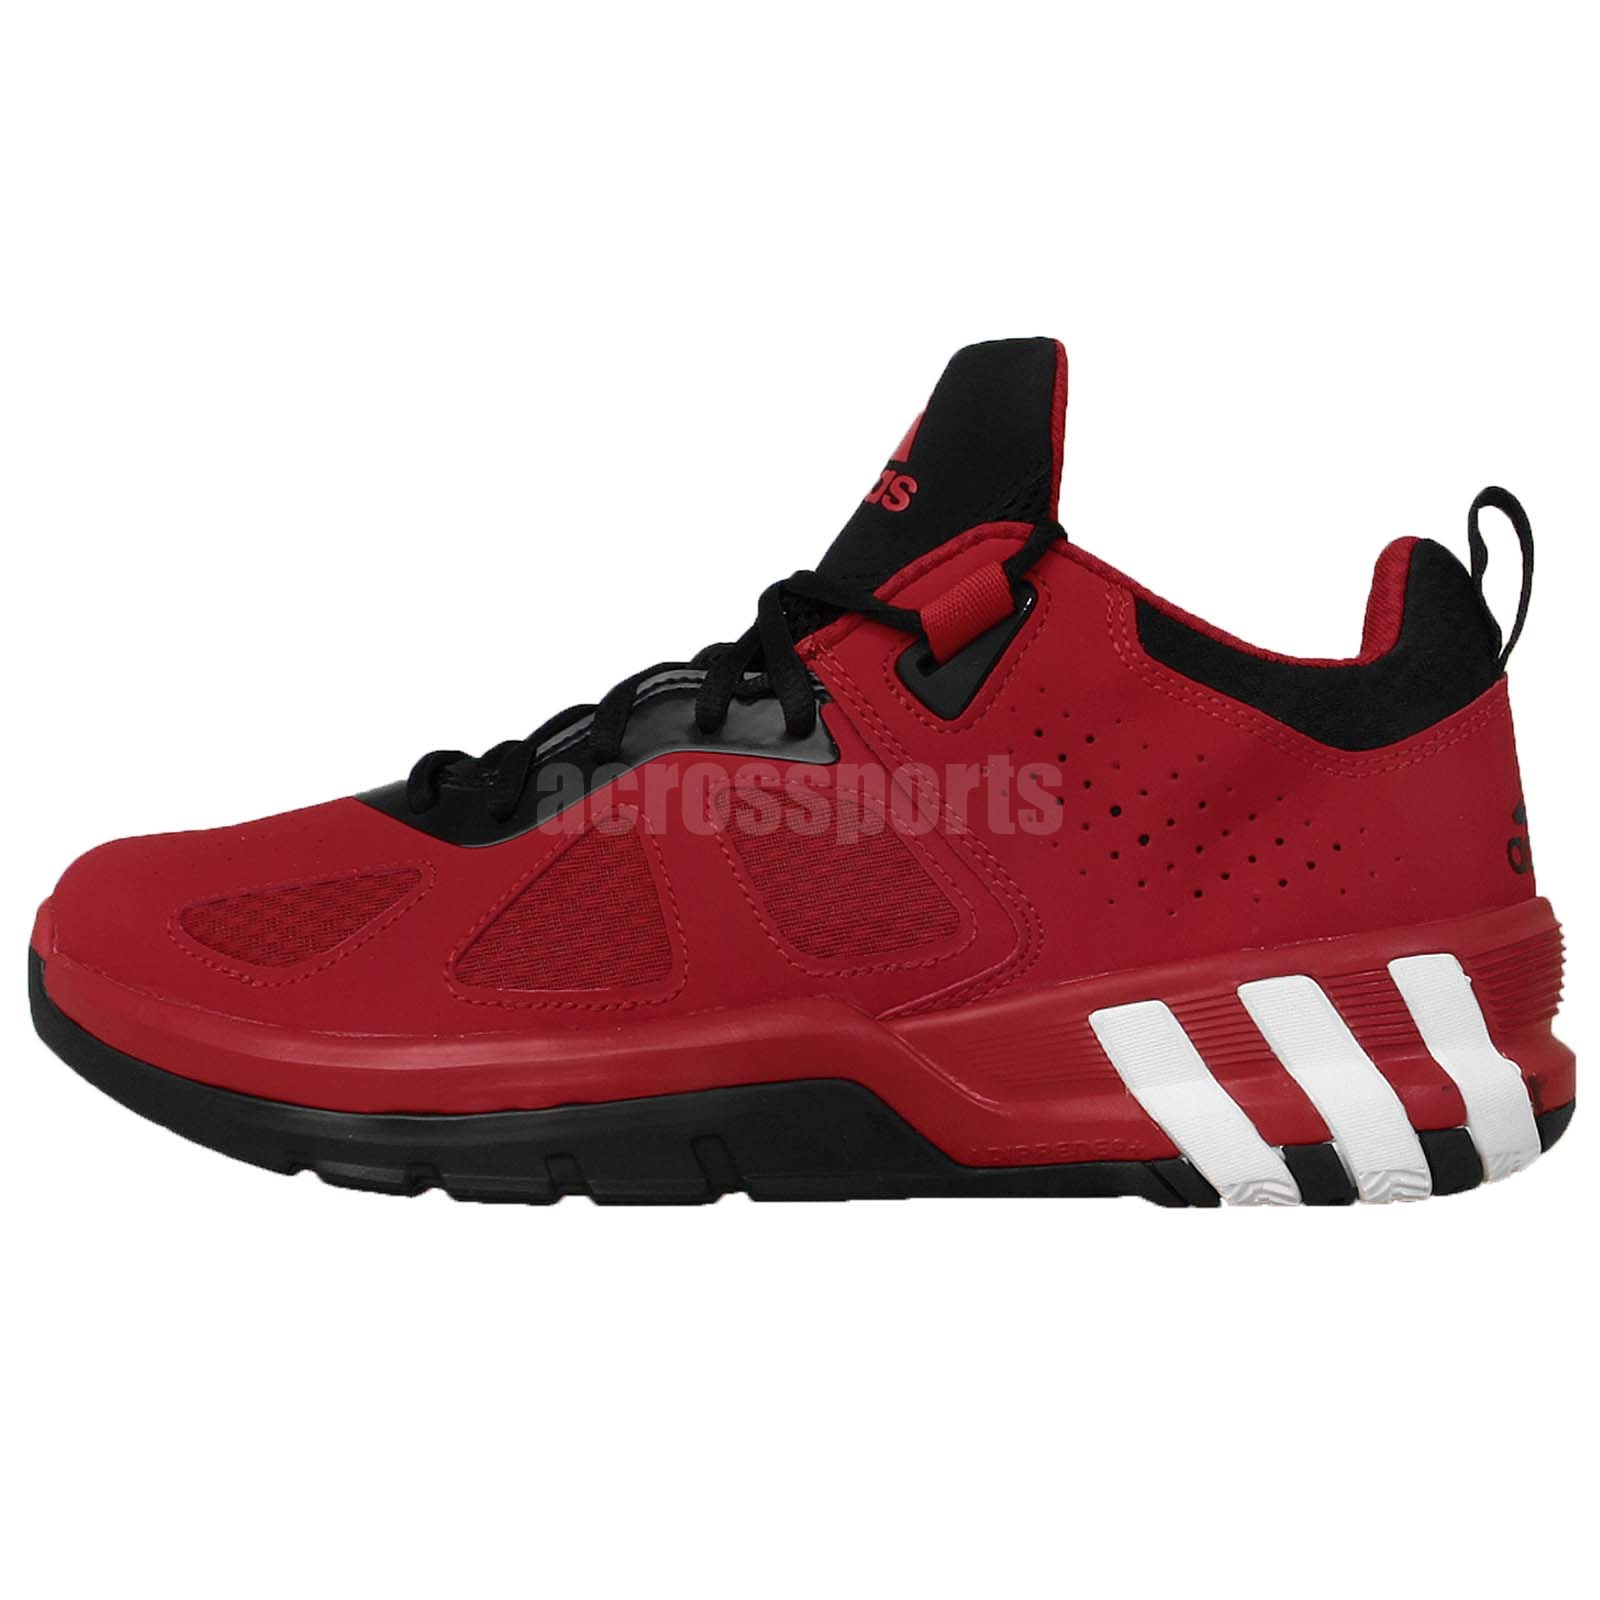 adidas crazyquick street red black 2015 mens basketball